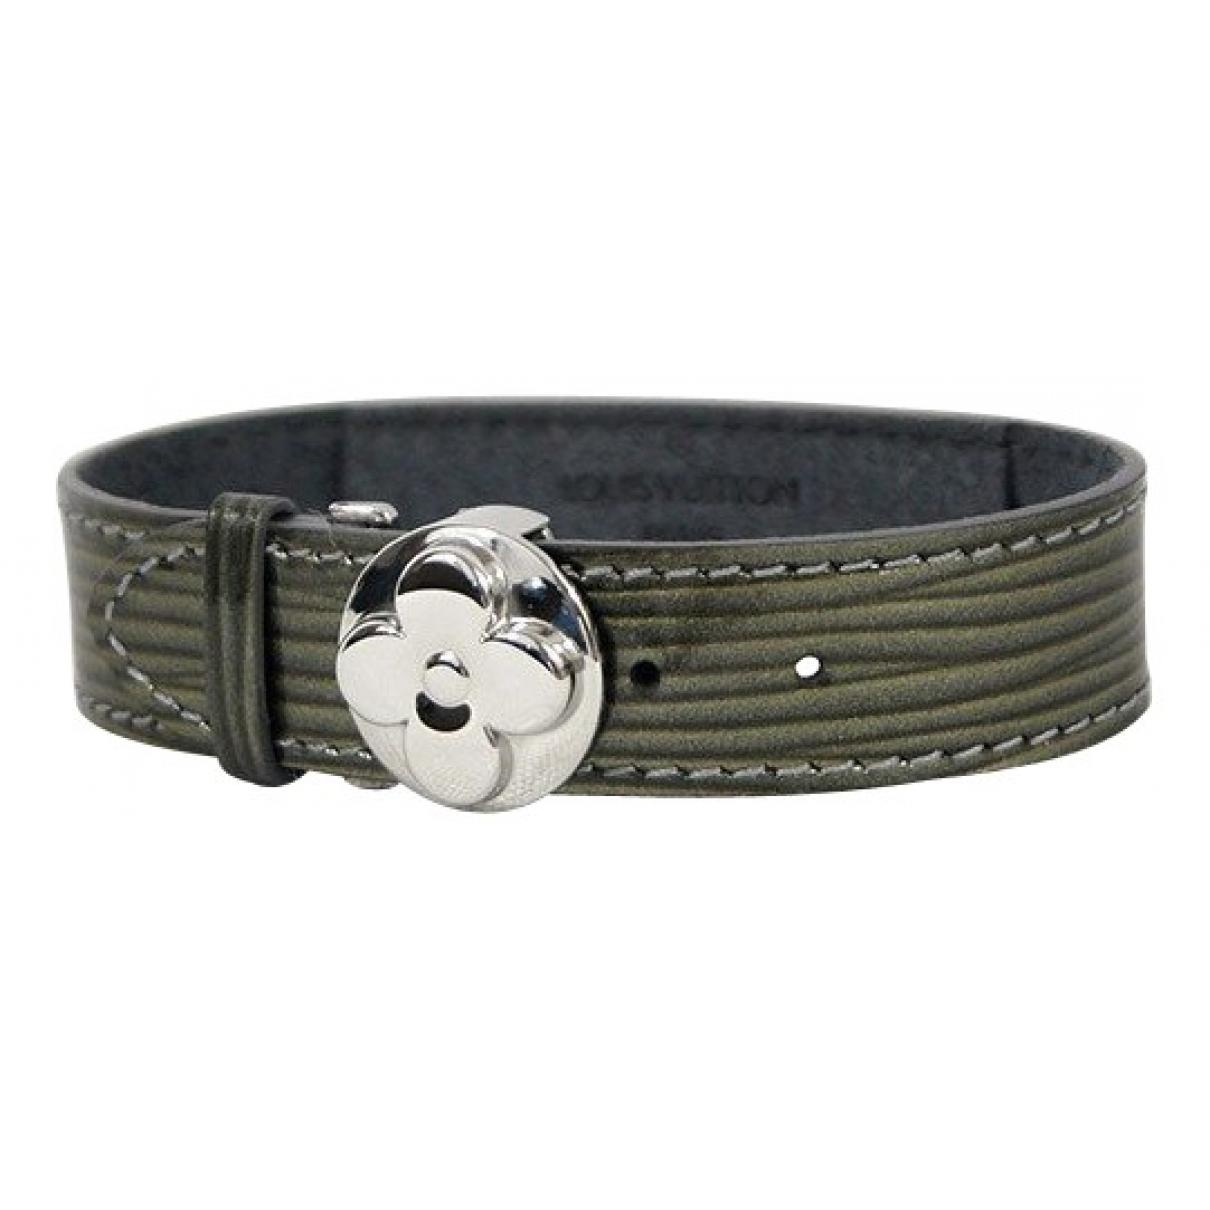 Louis Vuitton \N Armband in  Gruen Lackleder